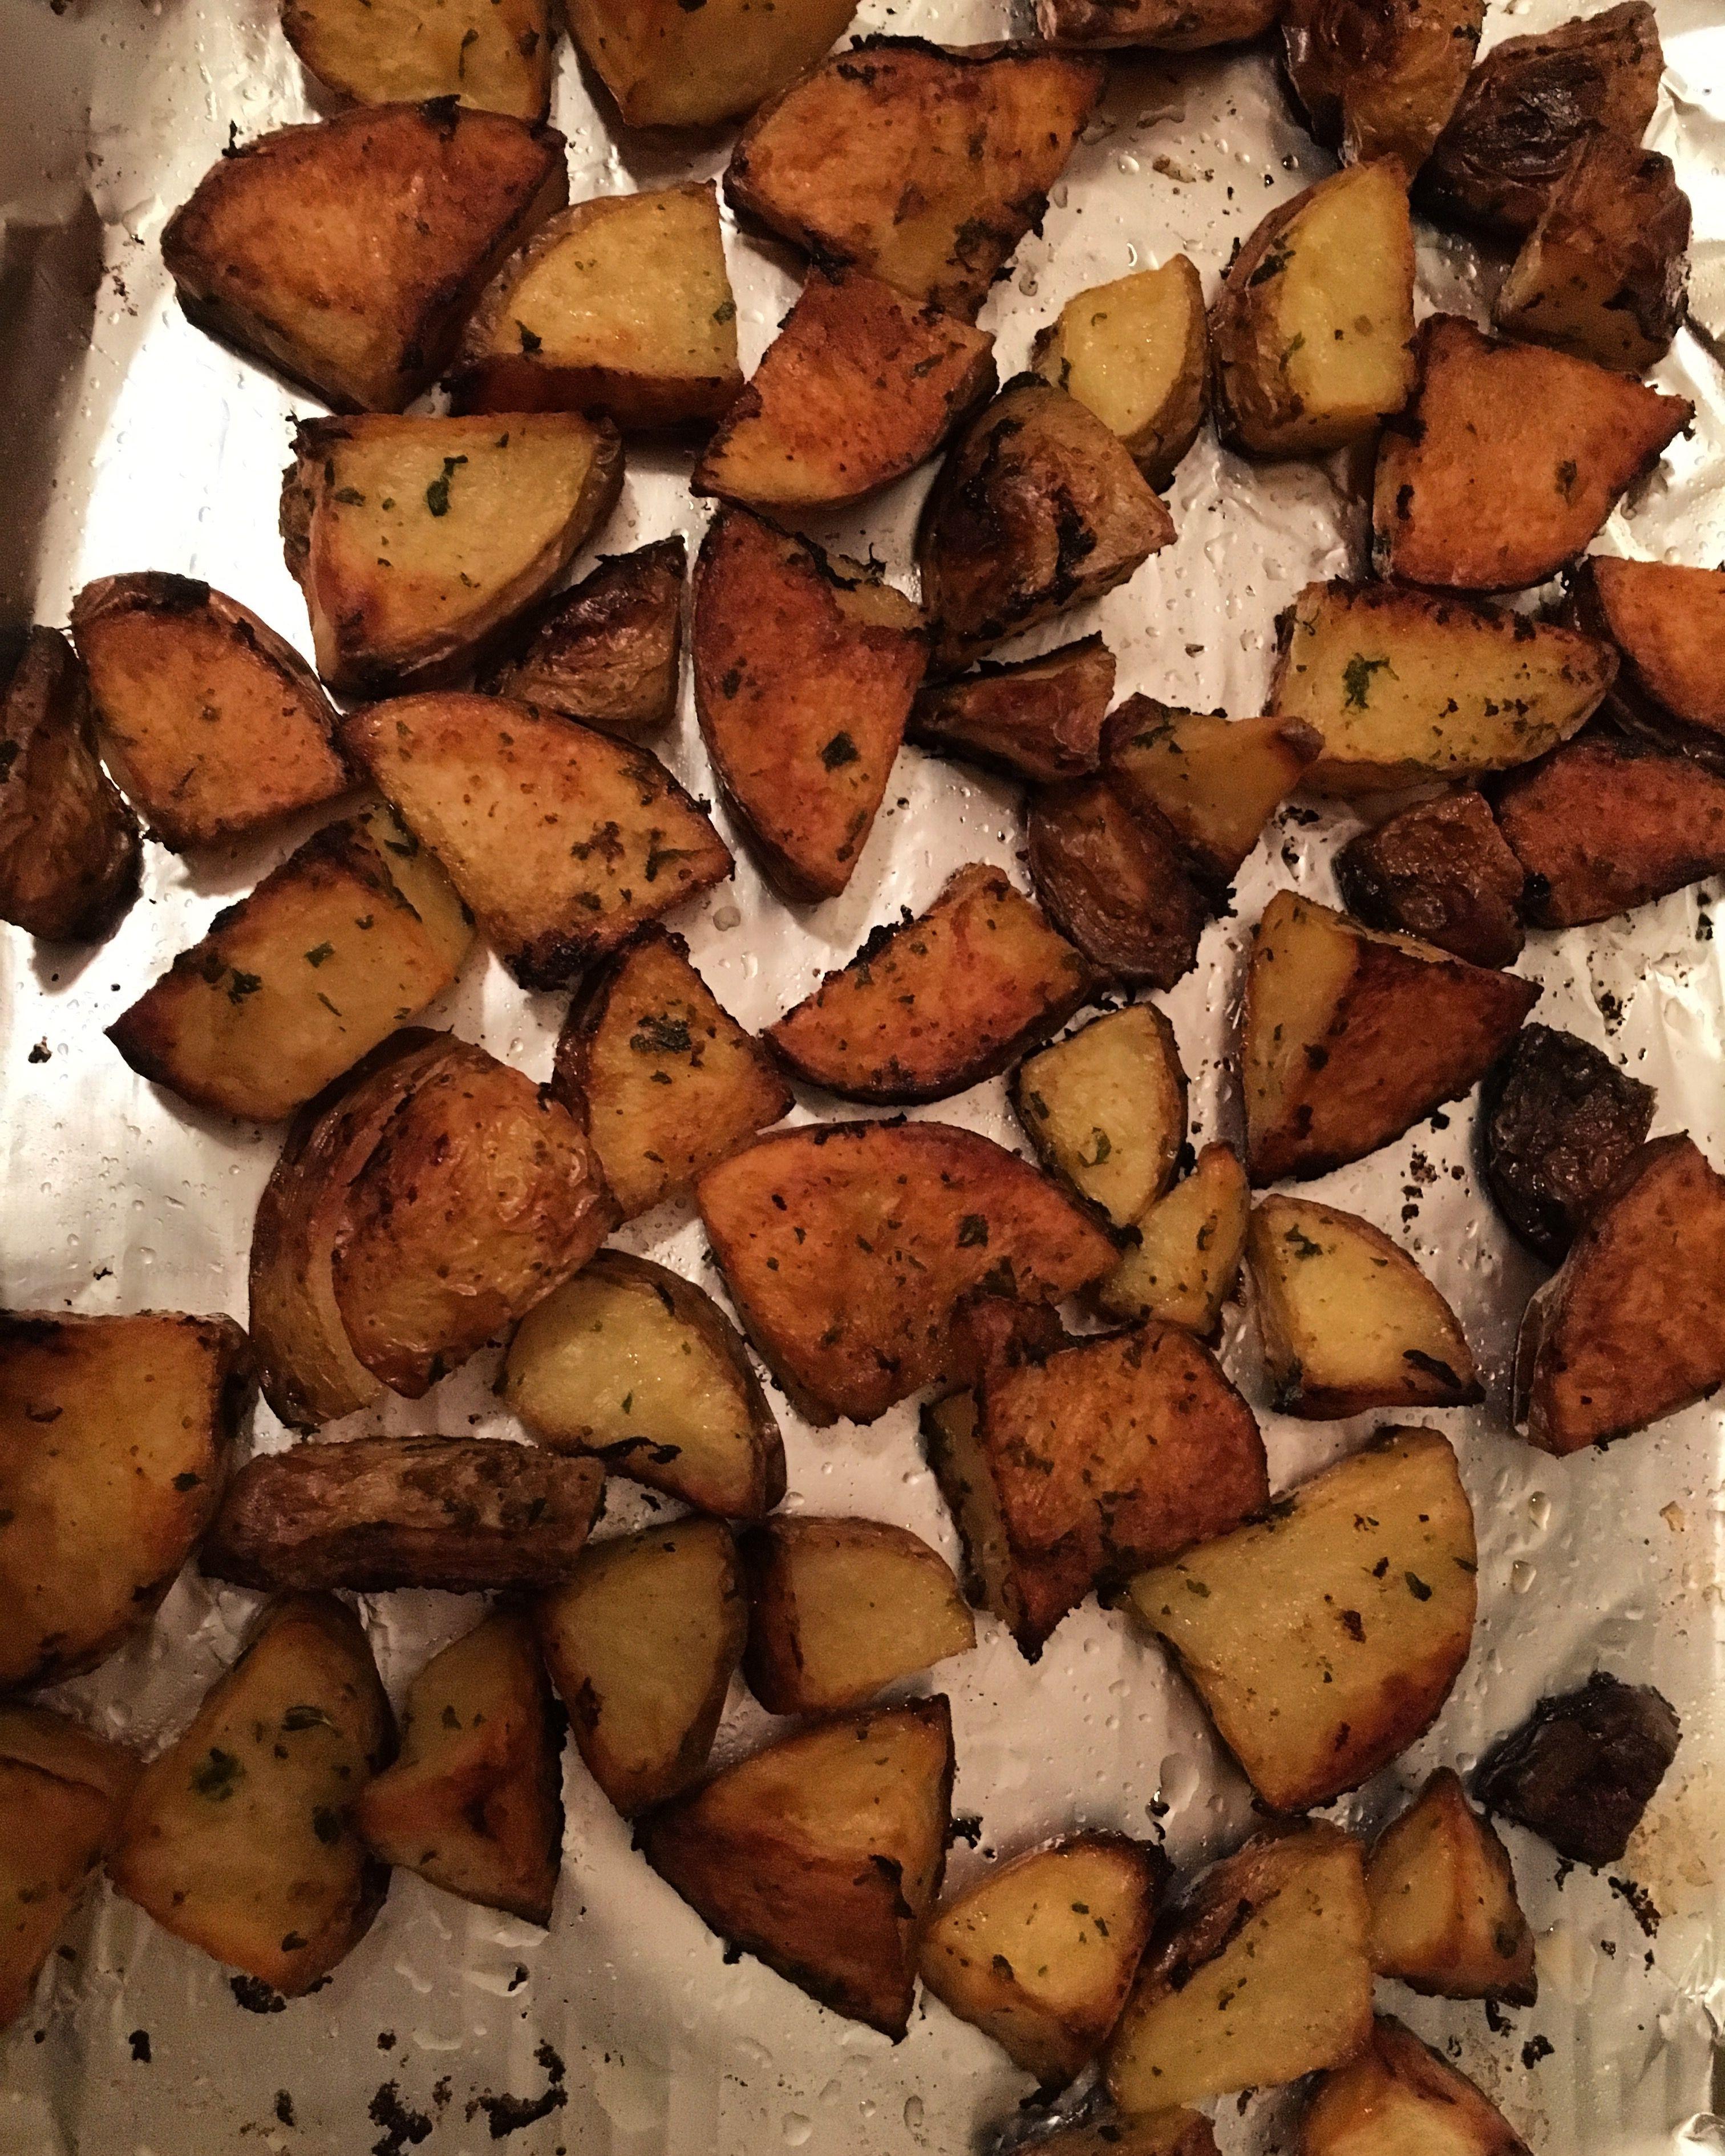 Oven Roasted Potatoes - Dads secret recipe